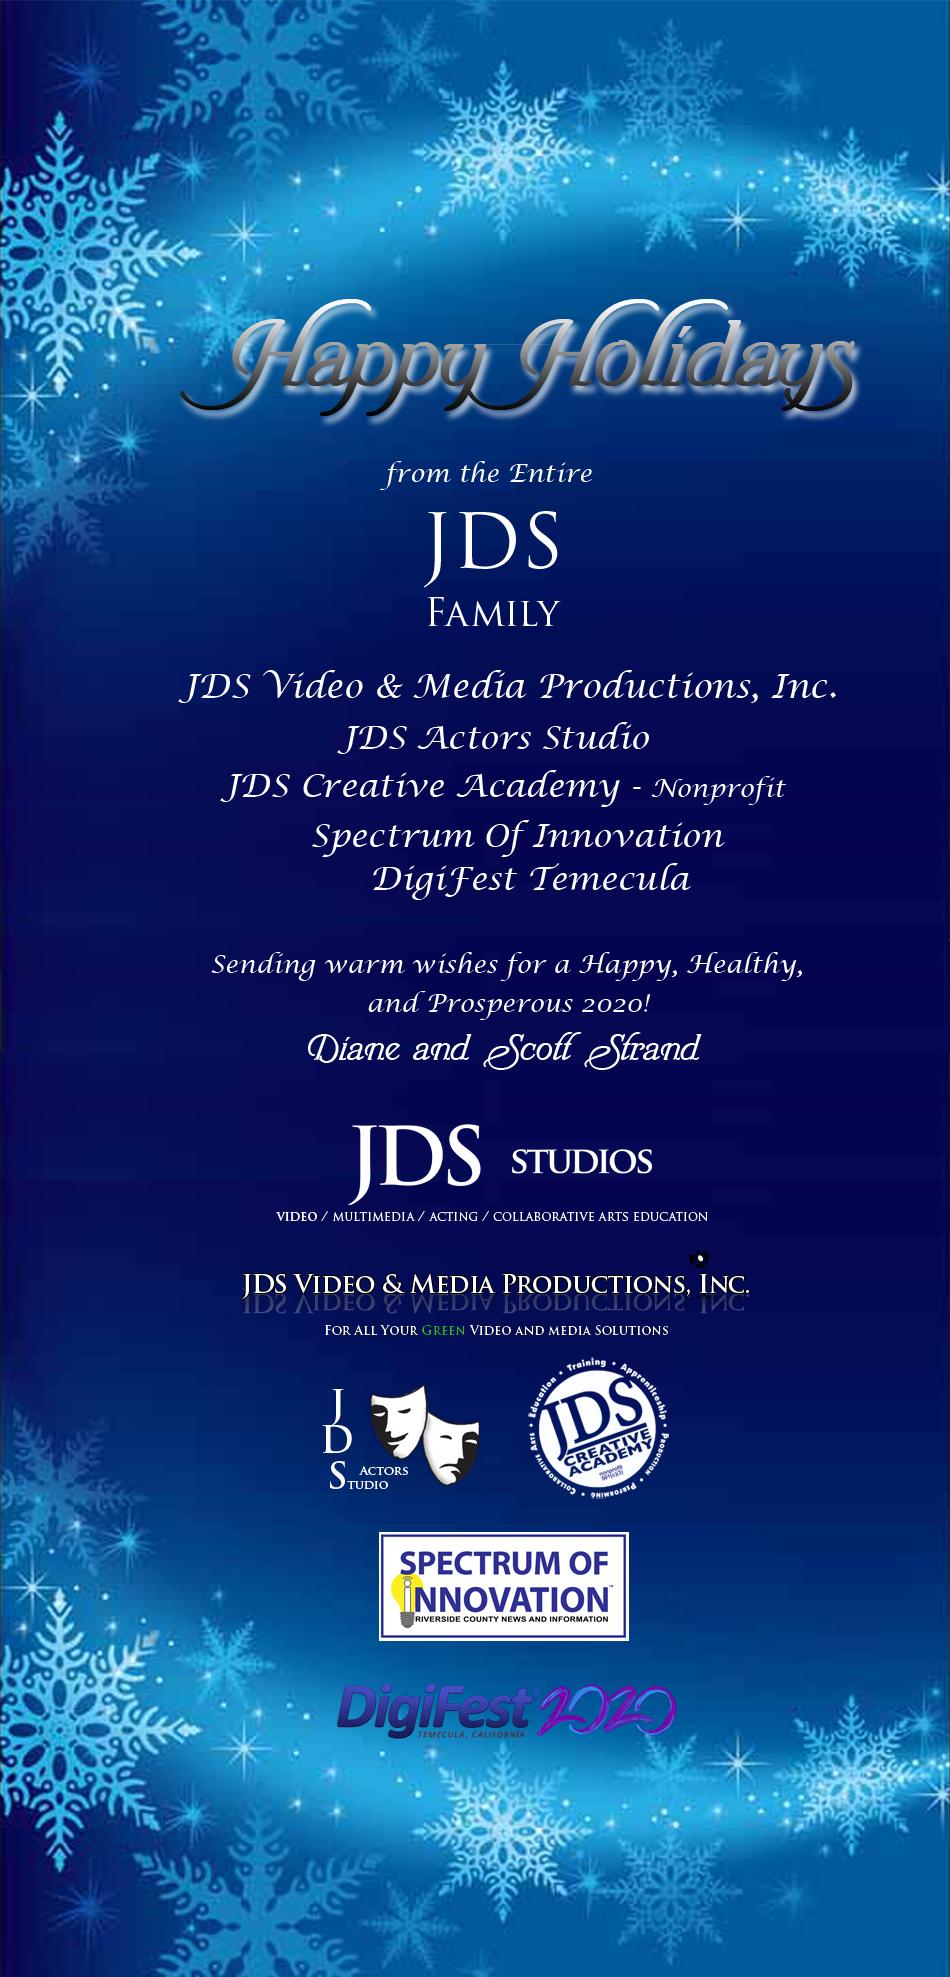 JDS Studios Happy Holidays-2019